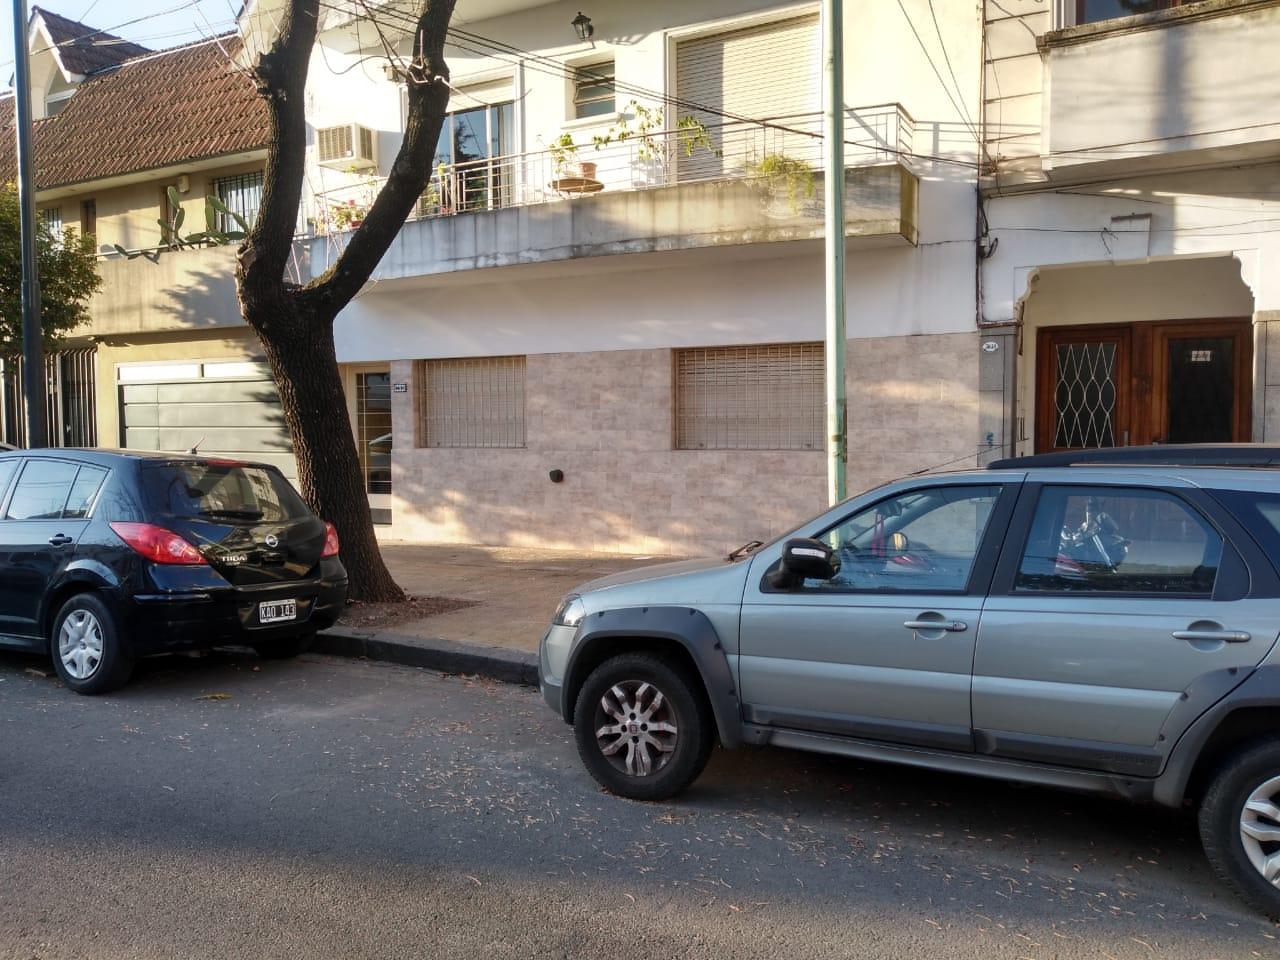 DEPARTAMENTO 3 AMB. PLANTA BAJA AL FRENTE